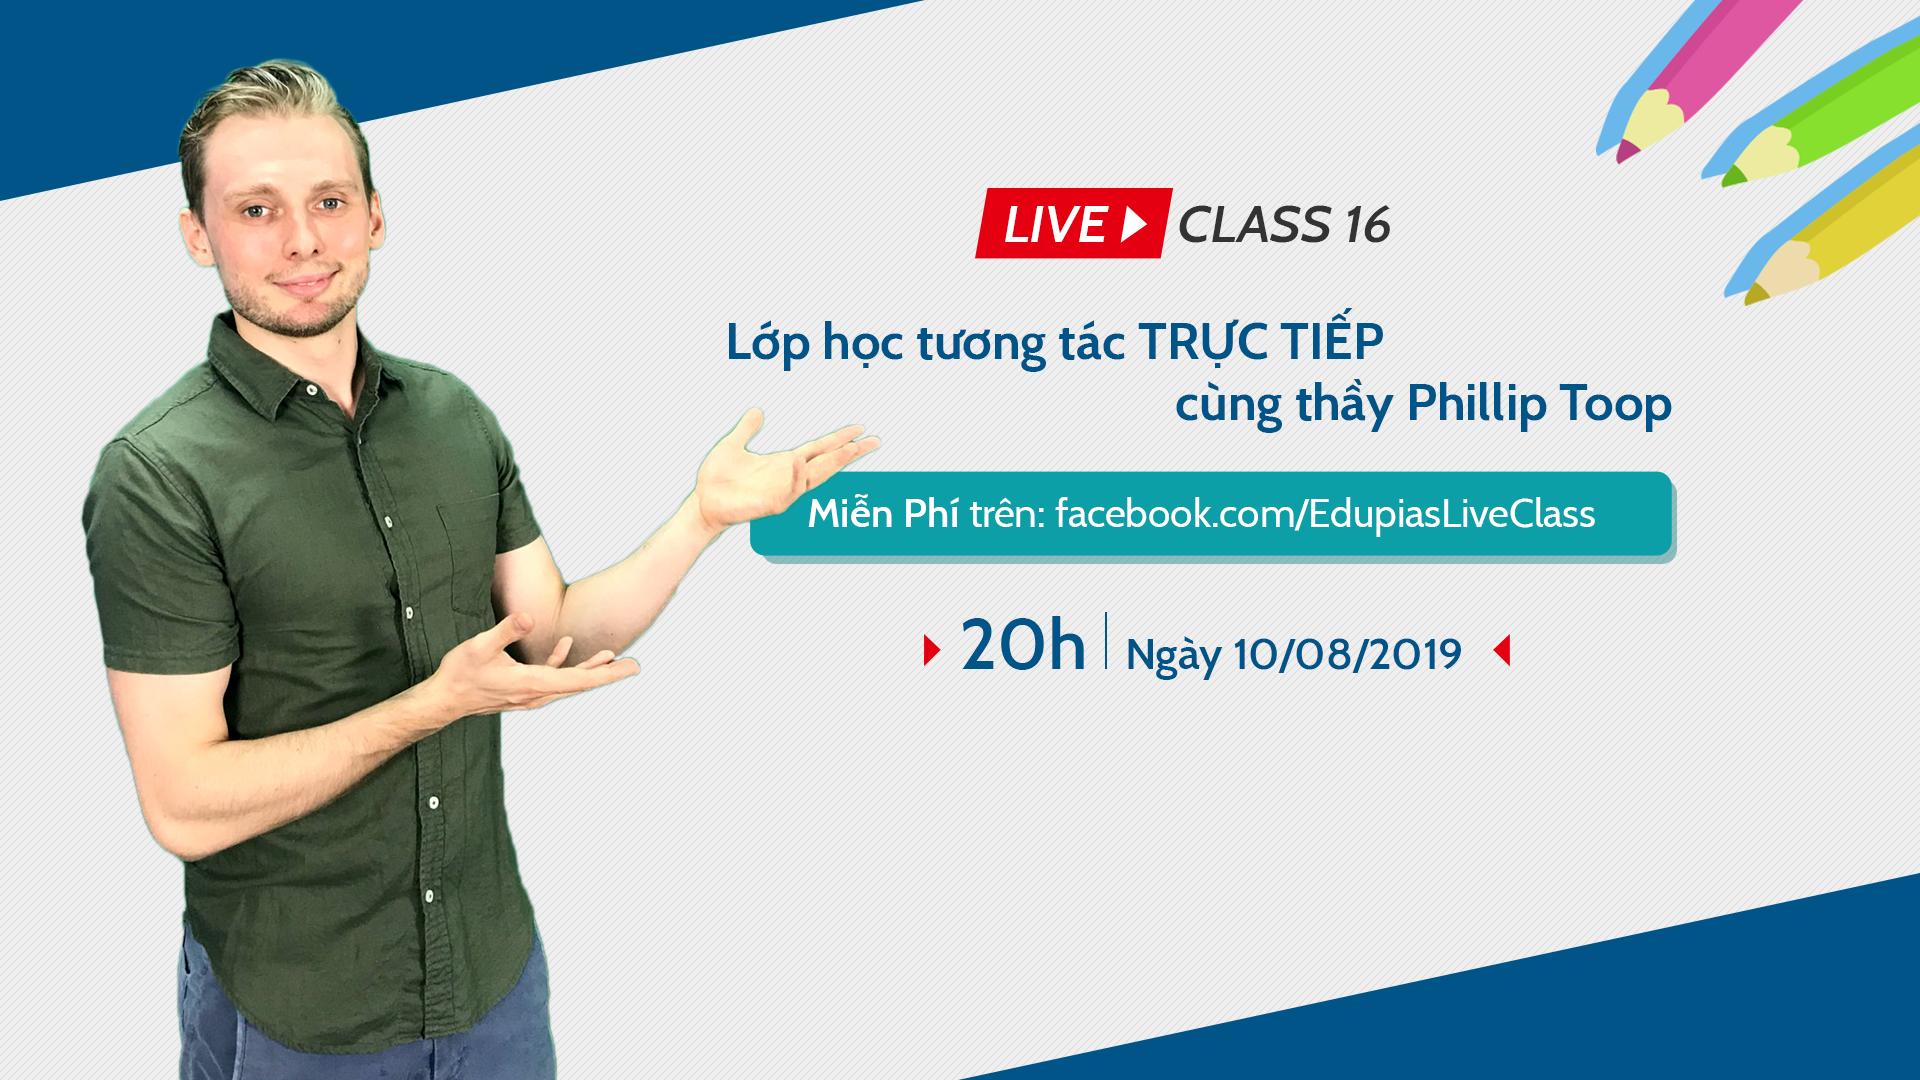 Live Class tuần 16 - Chủ đề: School supplies